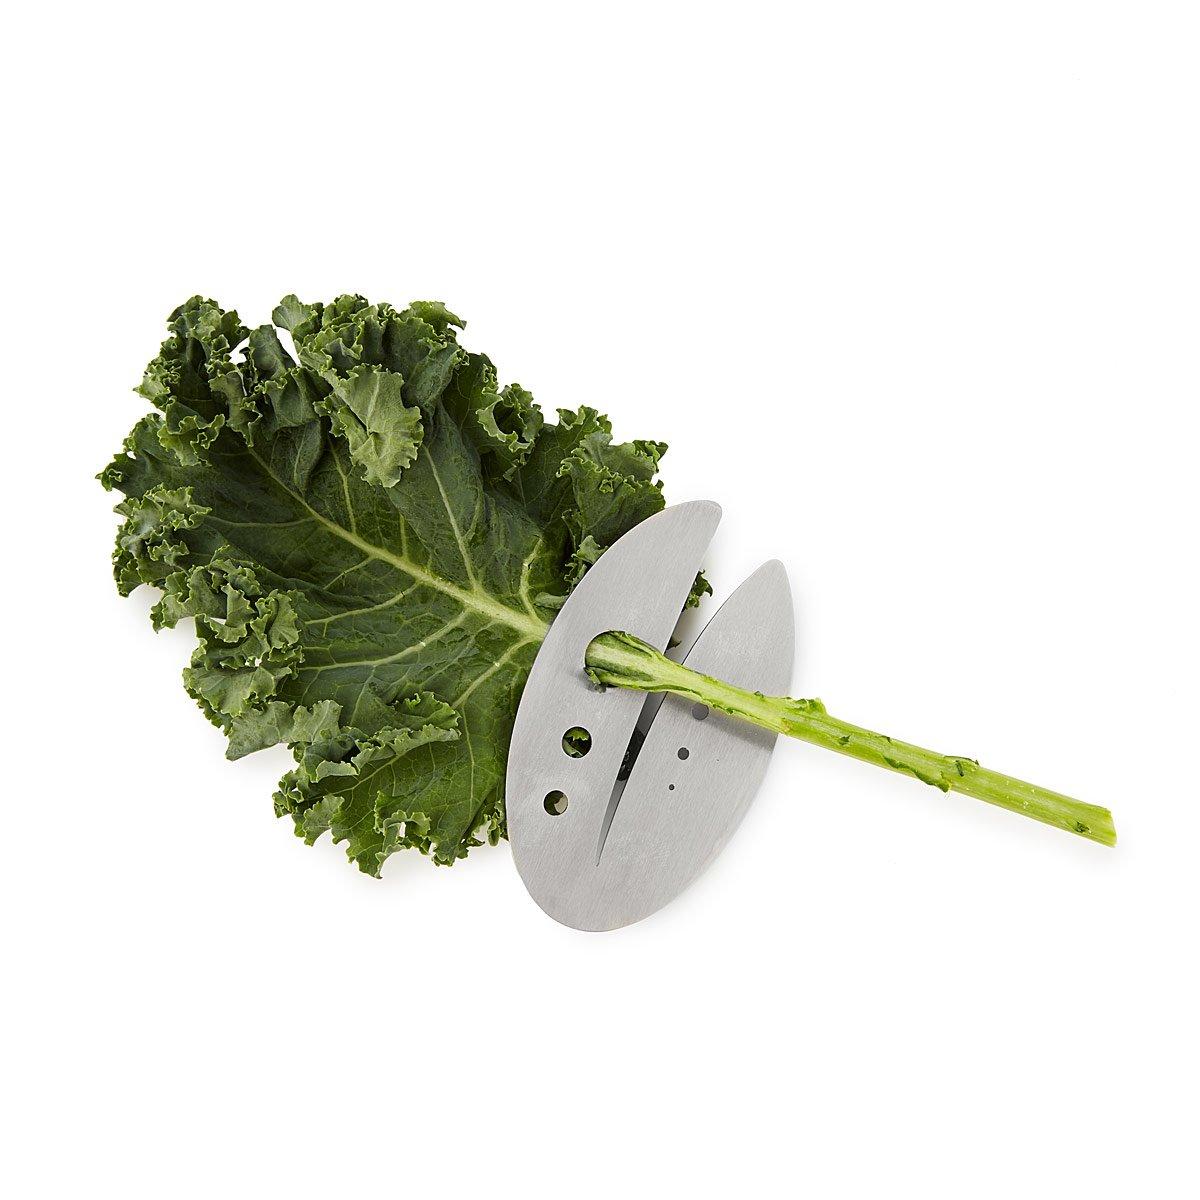 Kale & Herb Razor | UncommonGoods